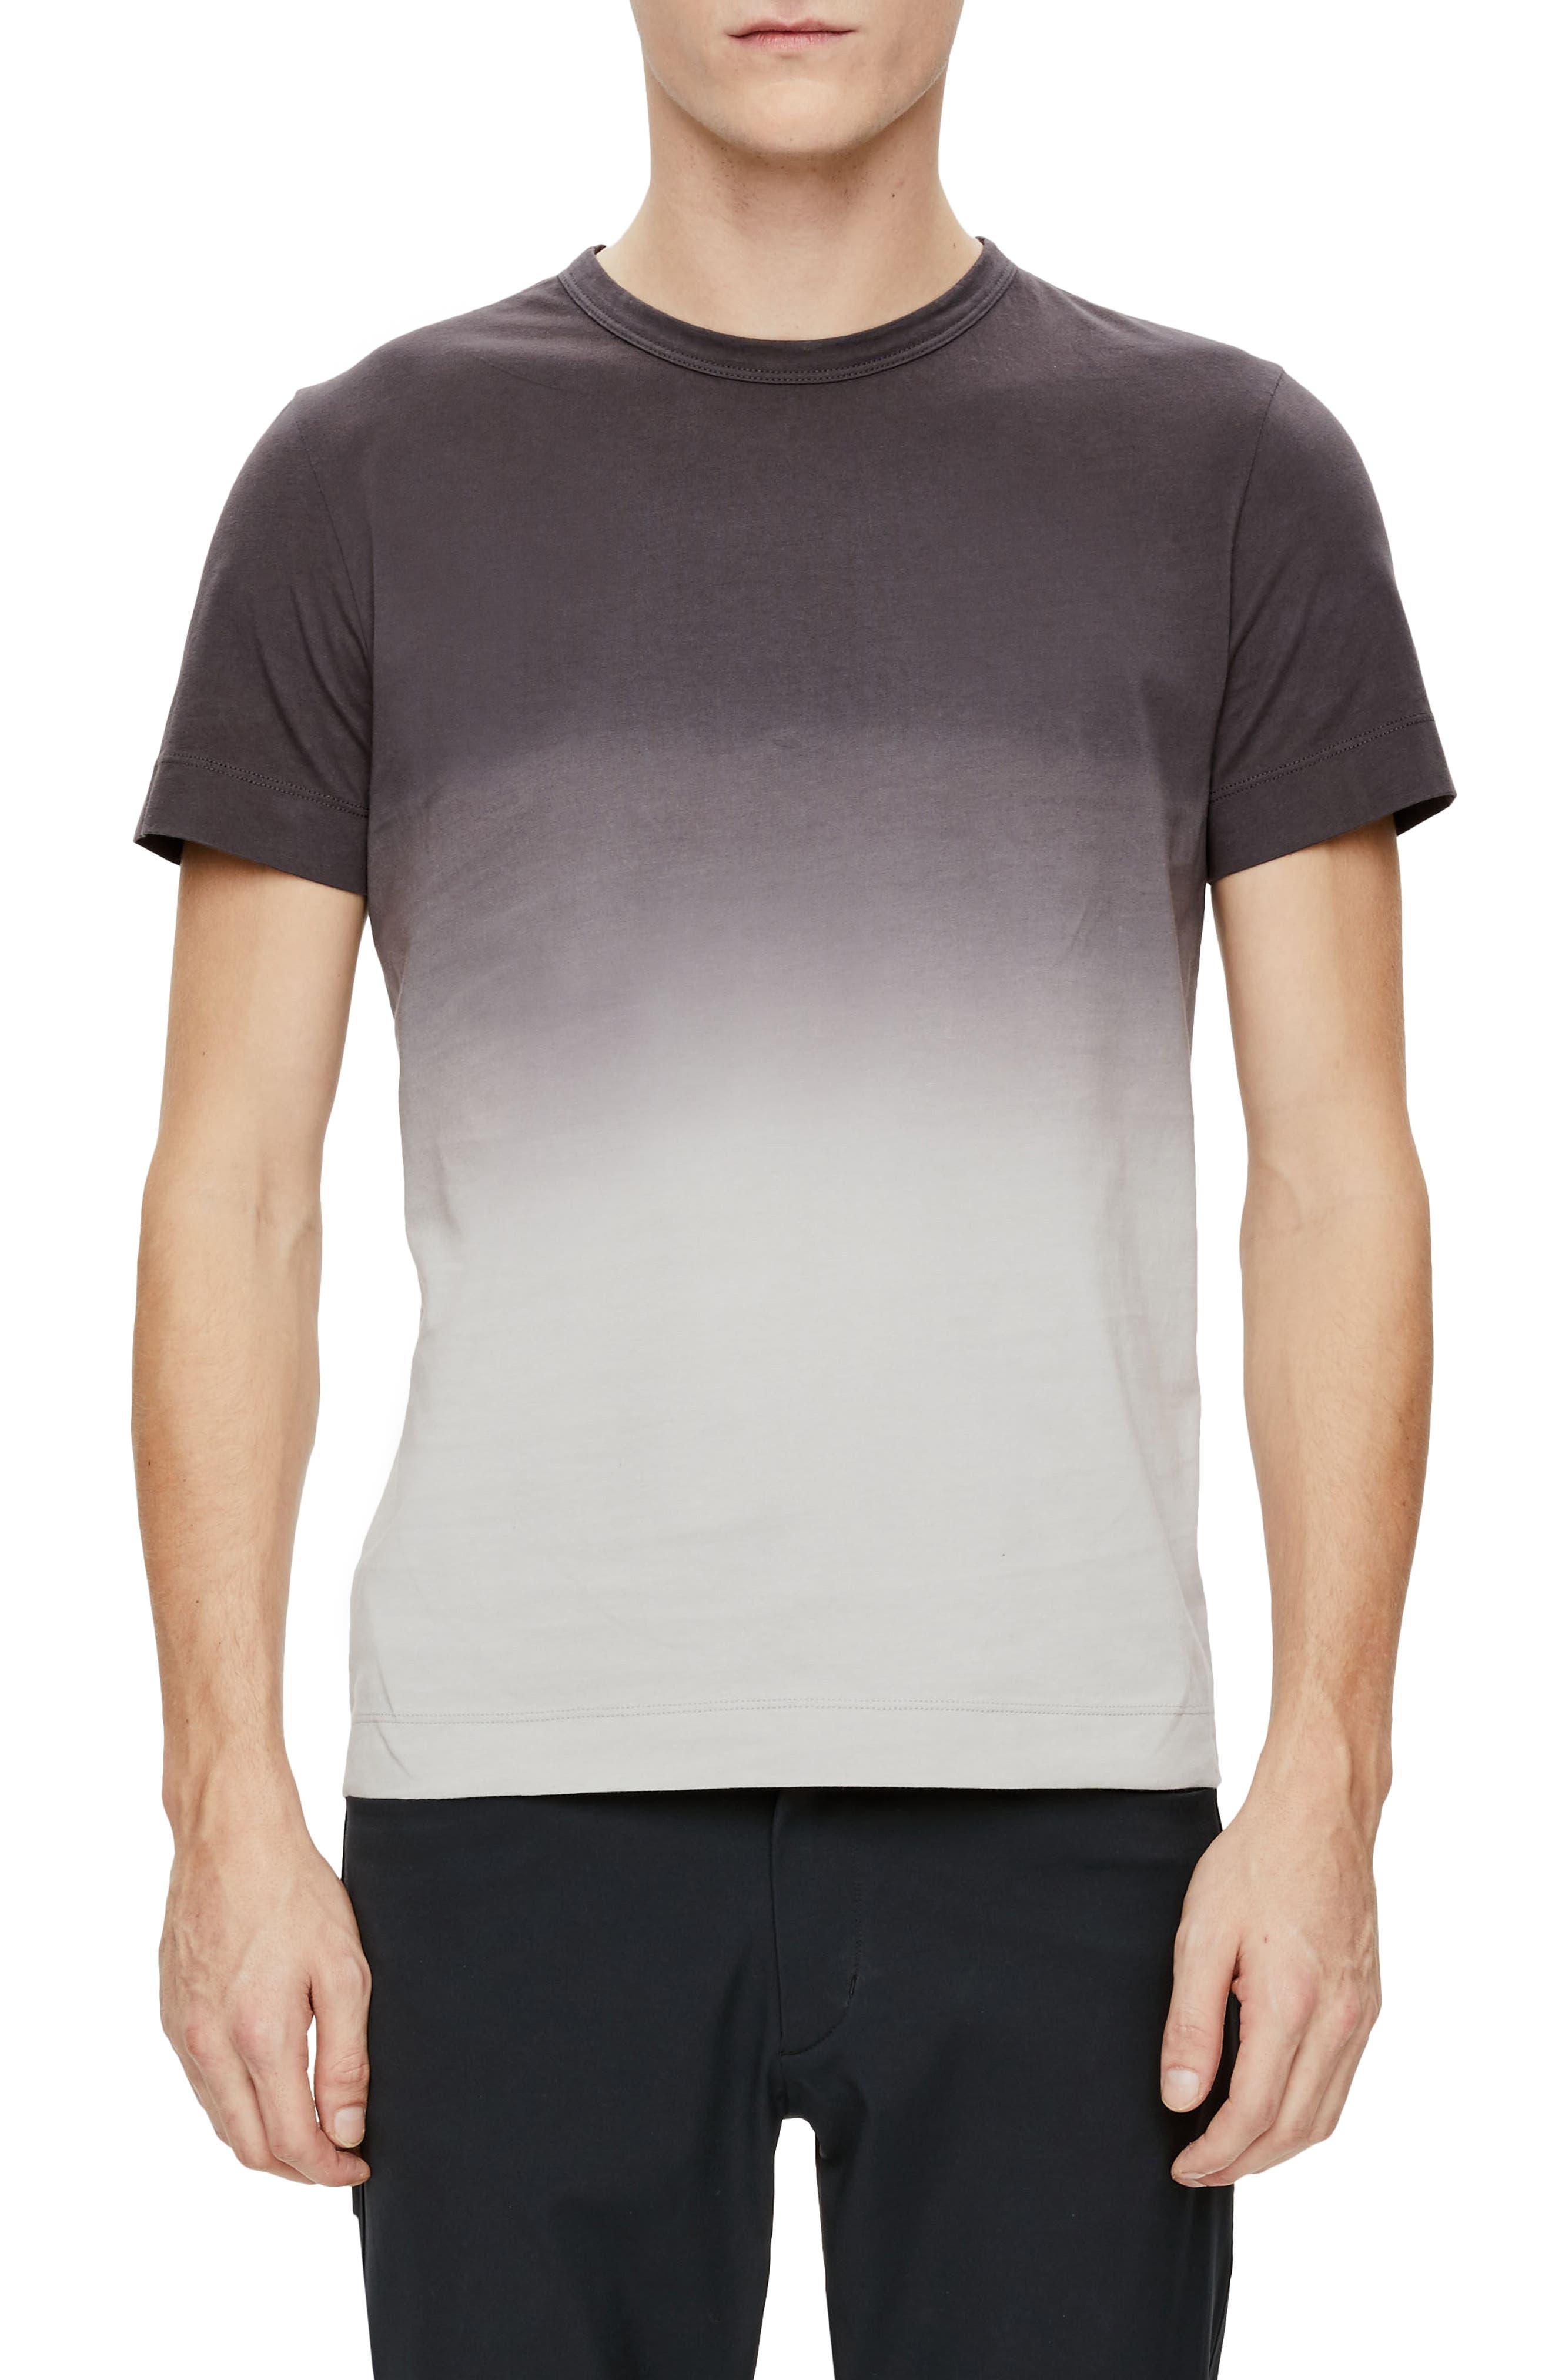 Gaskell Dip Dye Ombré T-Shirt,                             Main thumbnail 1, color,                             082